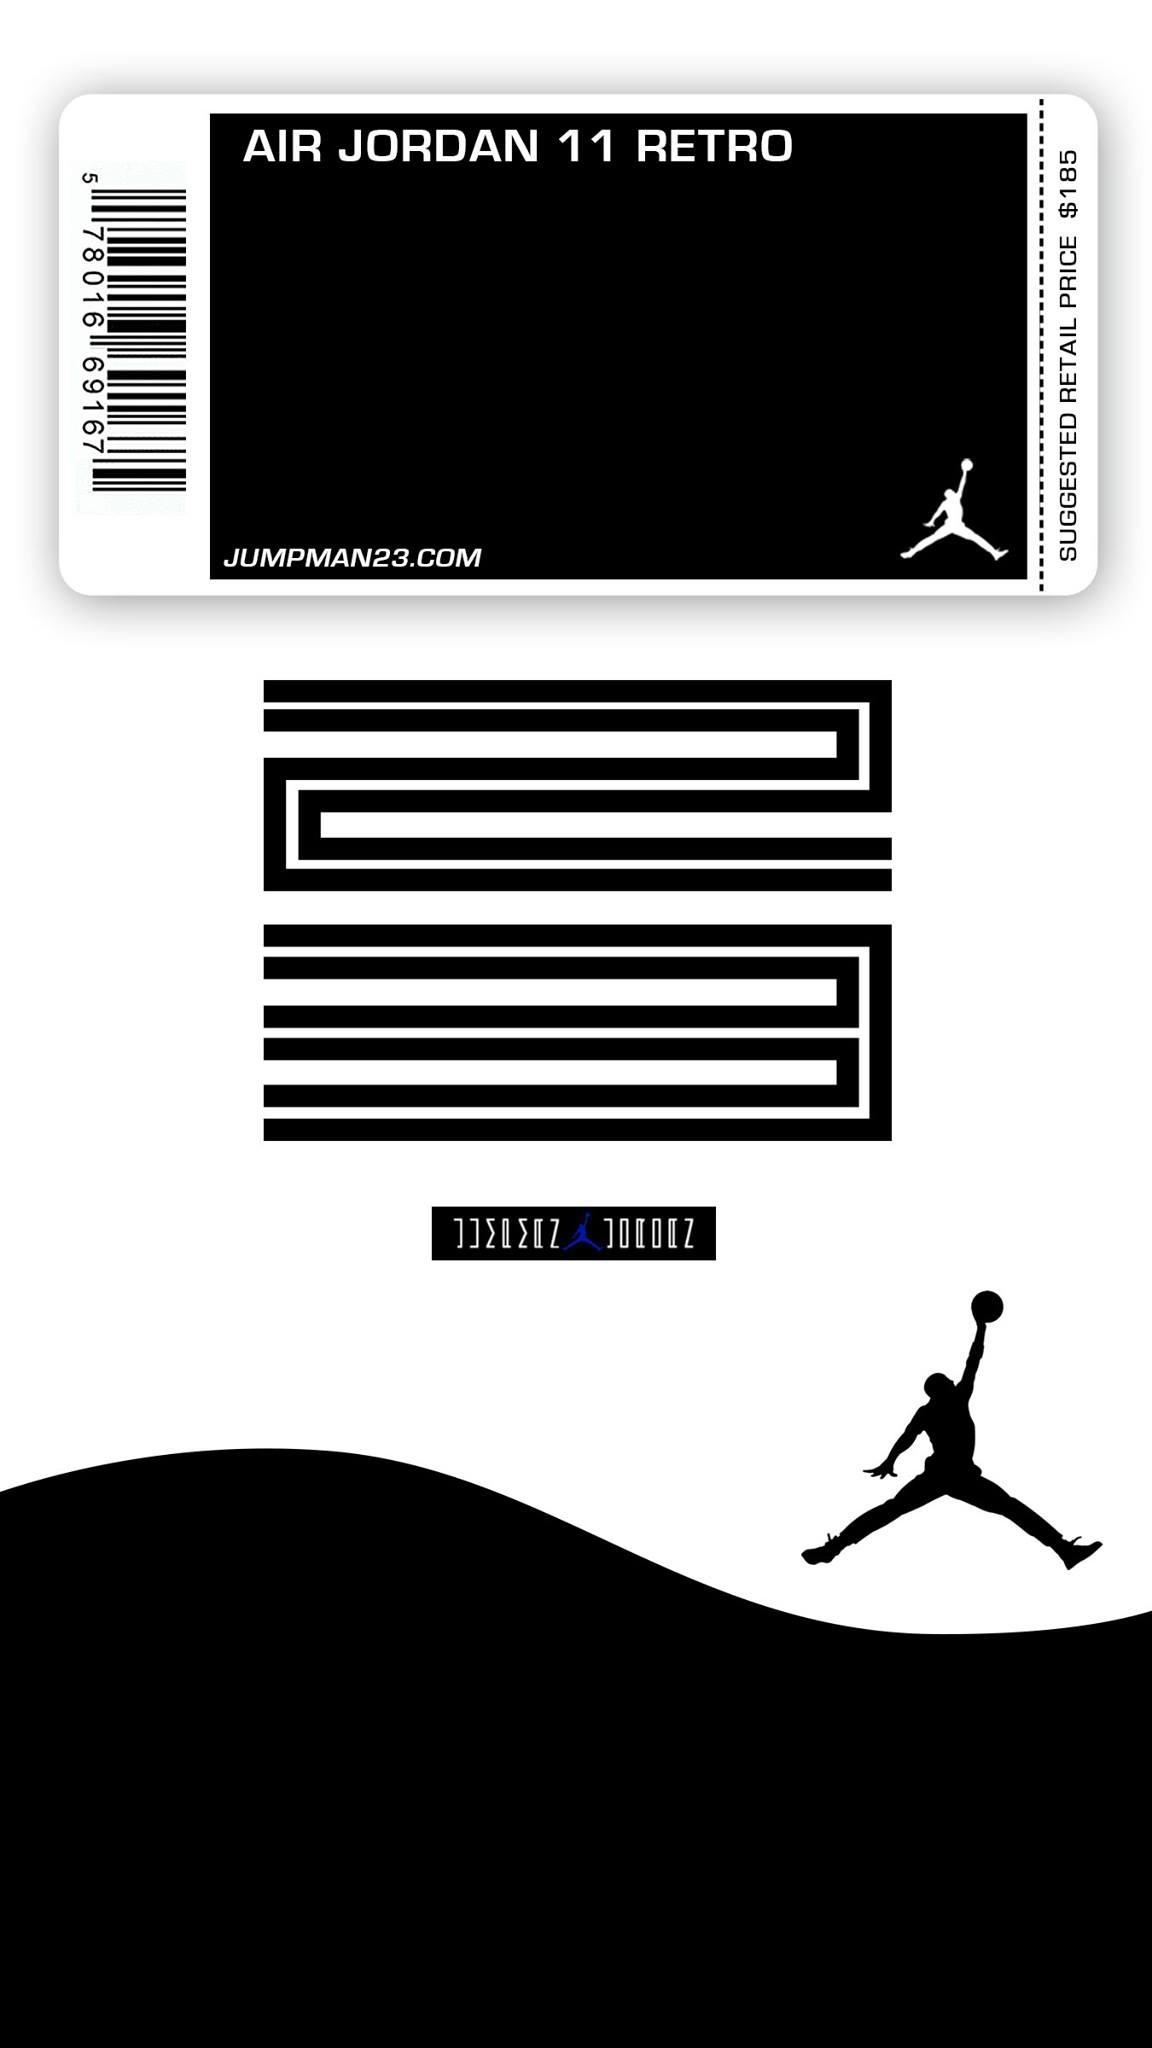 Jordan 11 concords mobile wallpaper. Nike WallpaperMobile WallpaperIphone  …